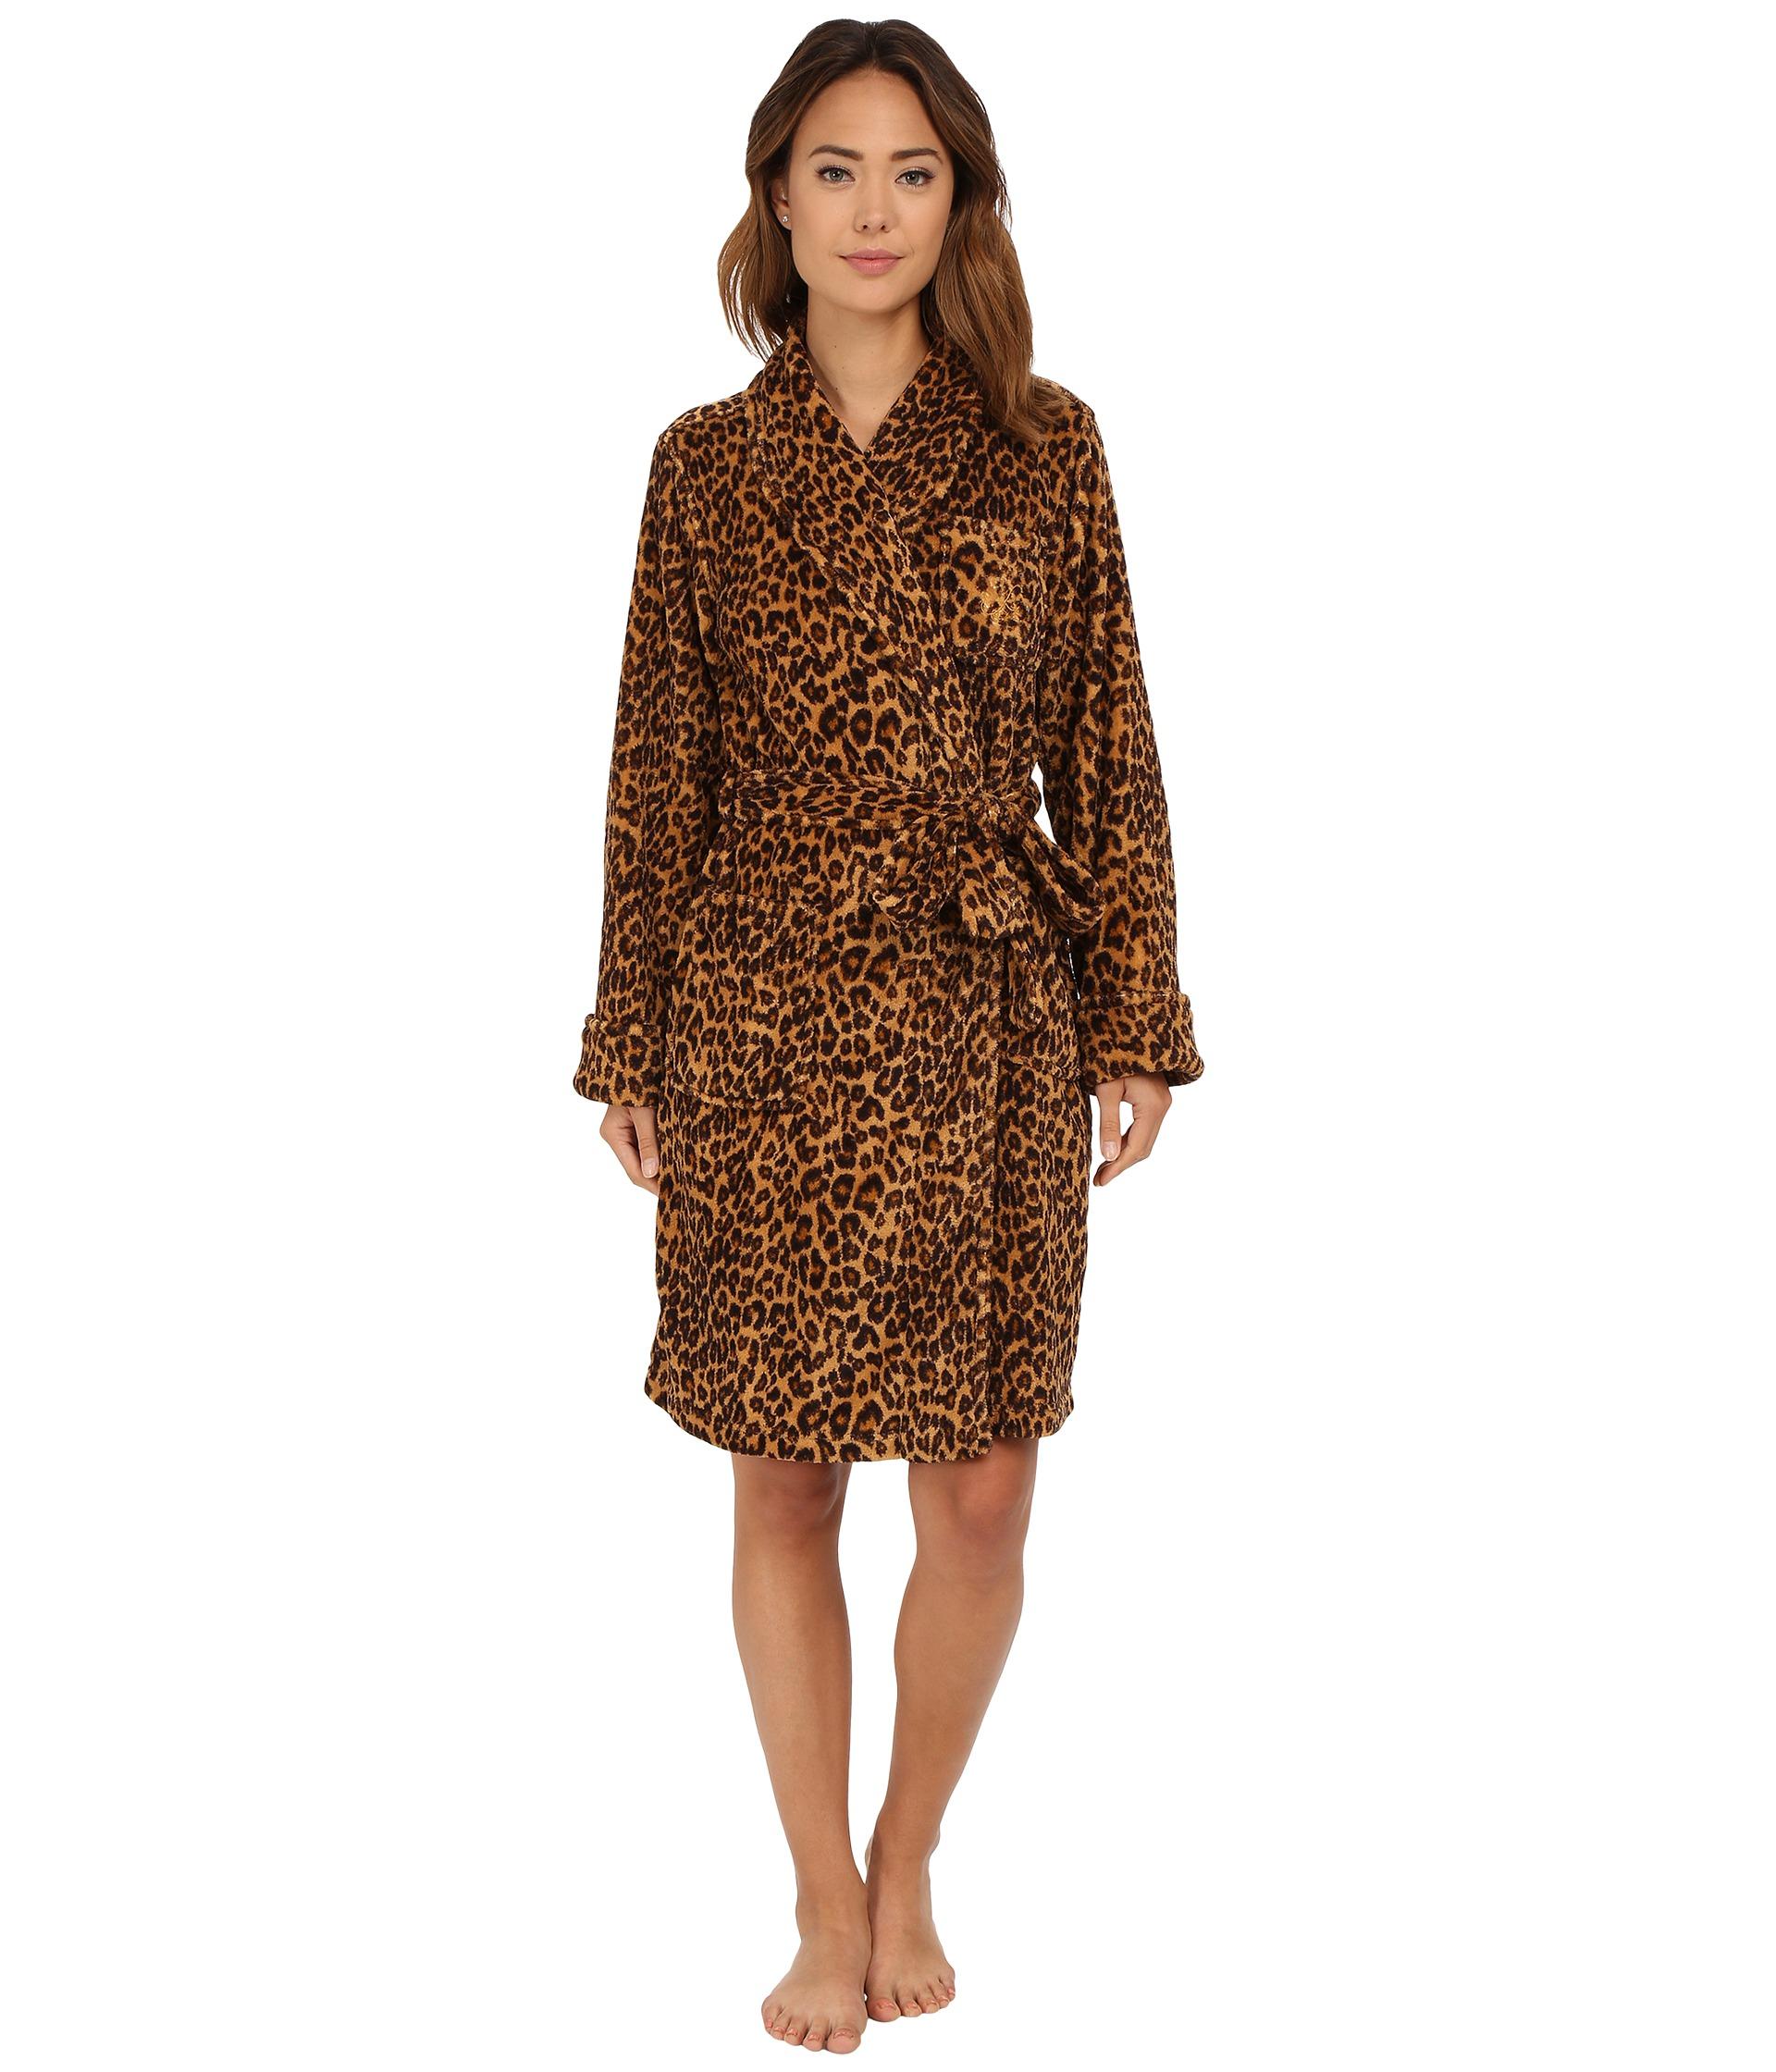 lauren by ralph lauren folded so soft terry short robe keene leopard free shipping